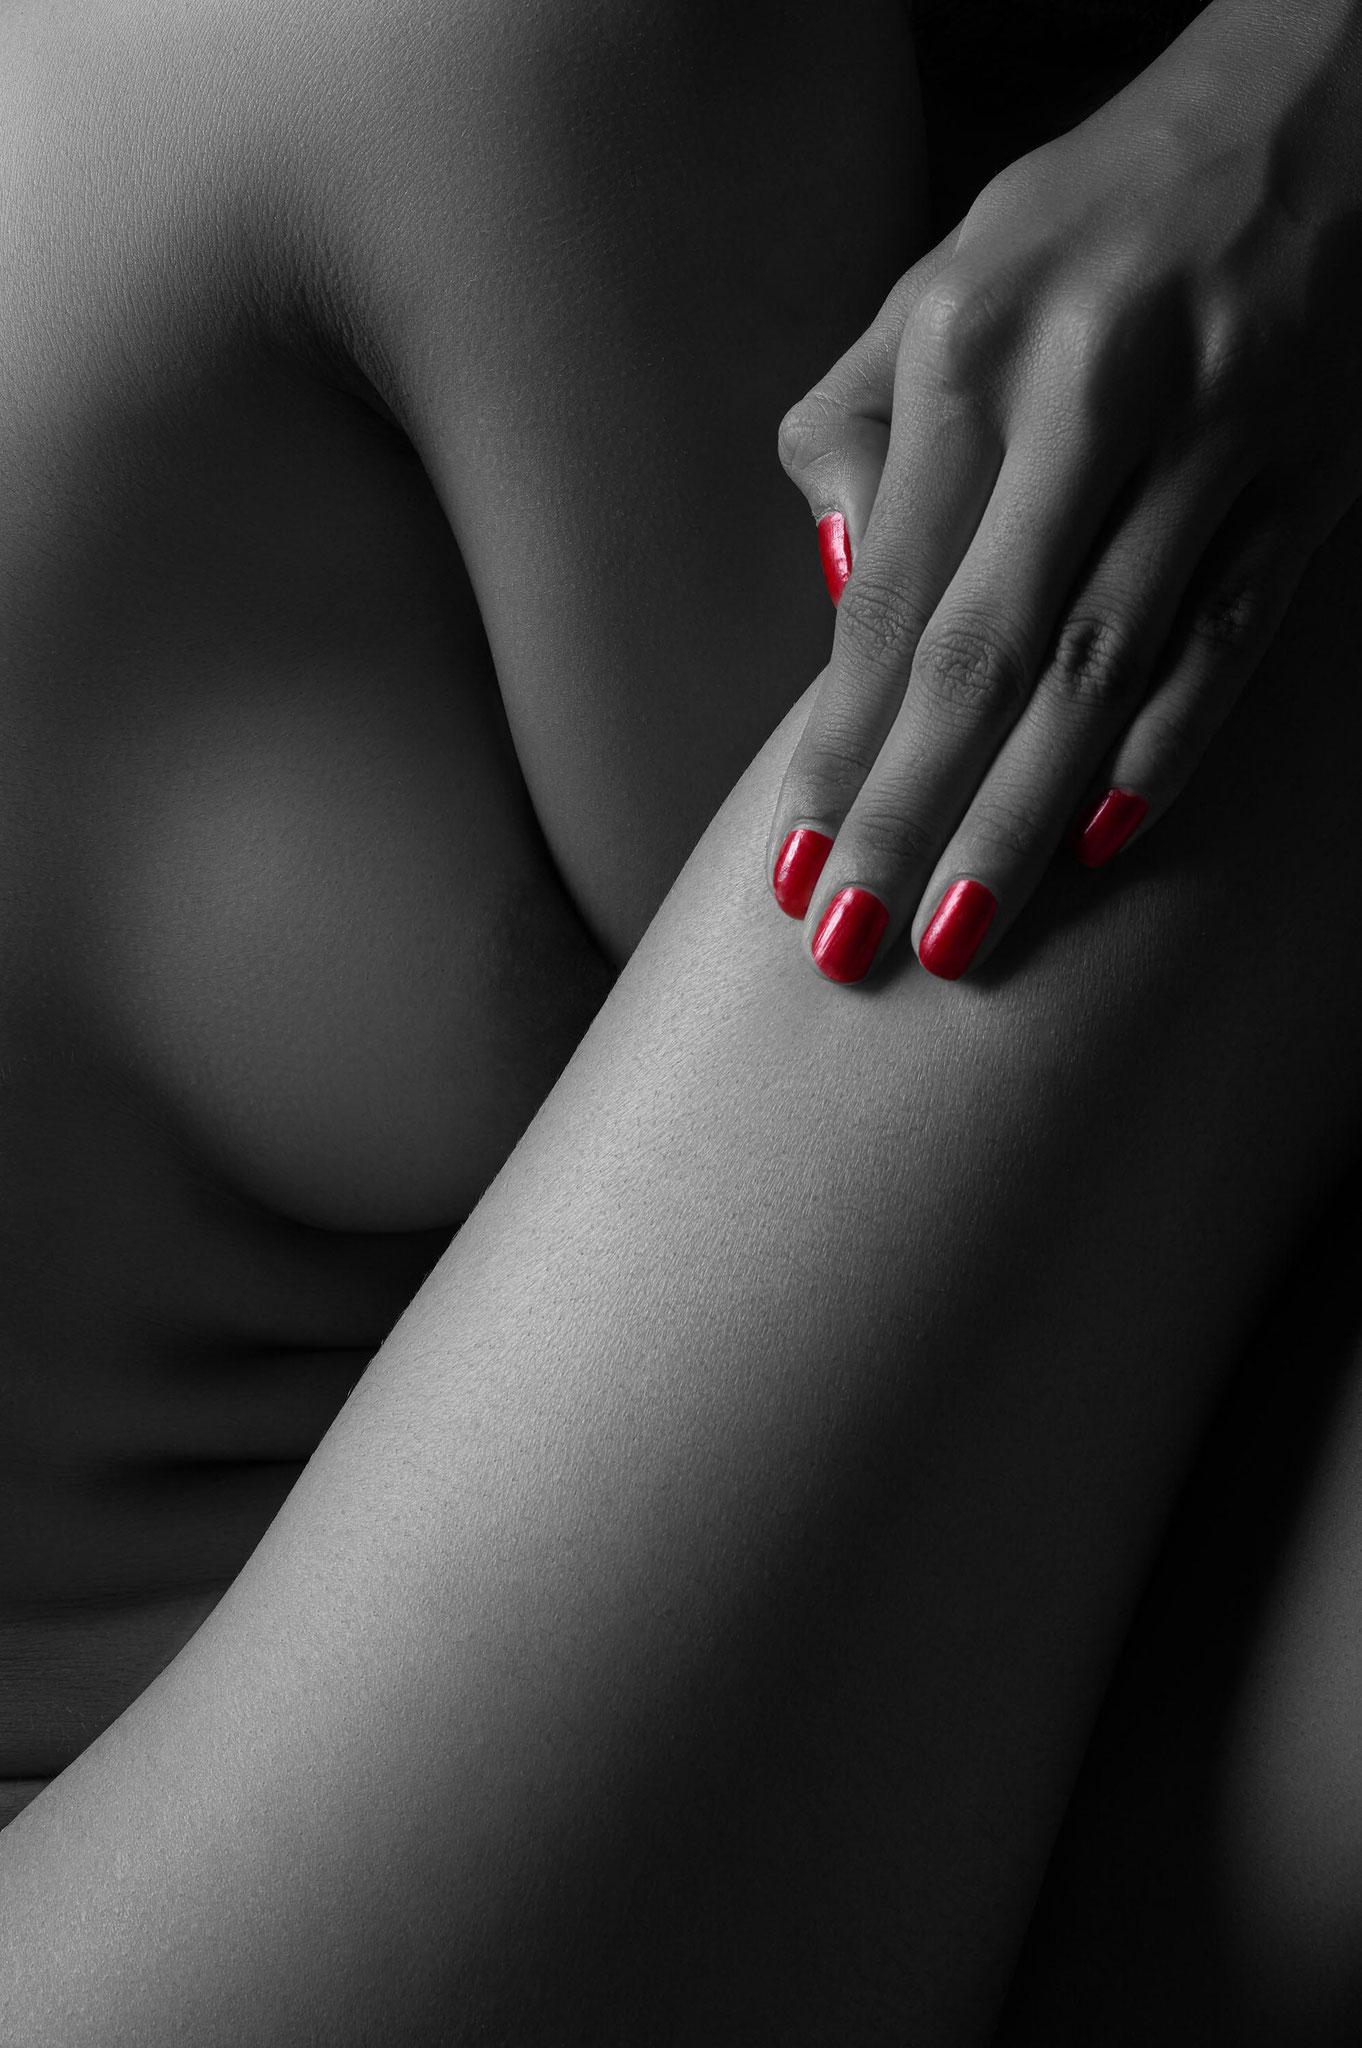 Duran Red EFIAP (India) - Nails